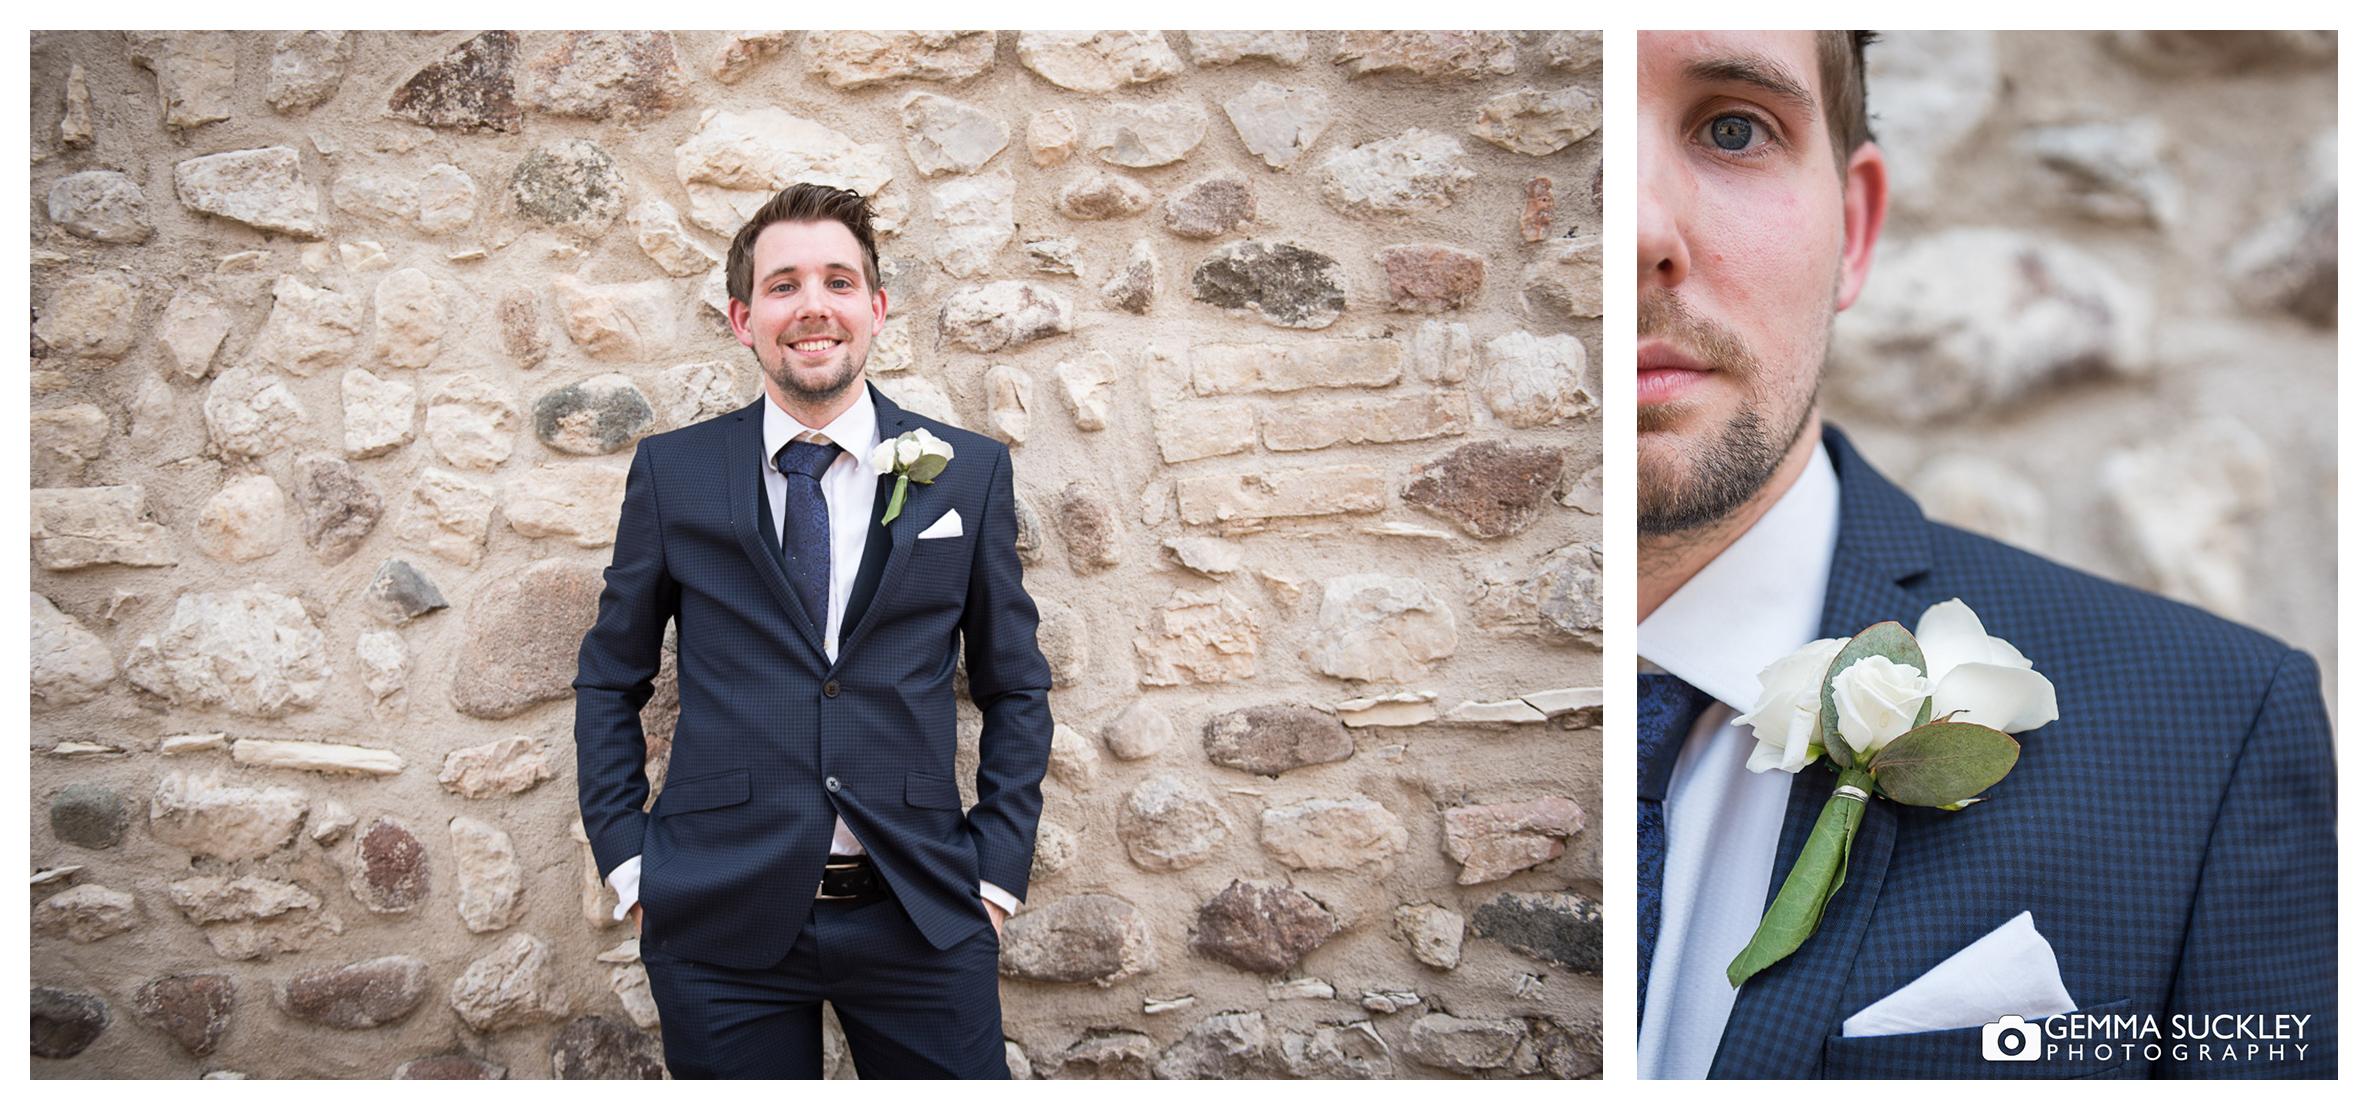 groom at his wedding abroad, Lake Garda wedding